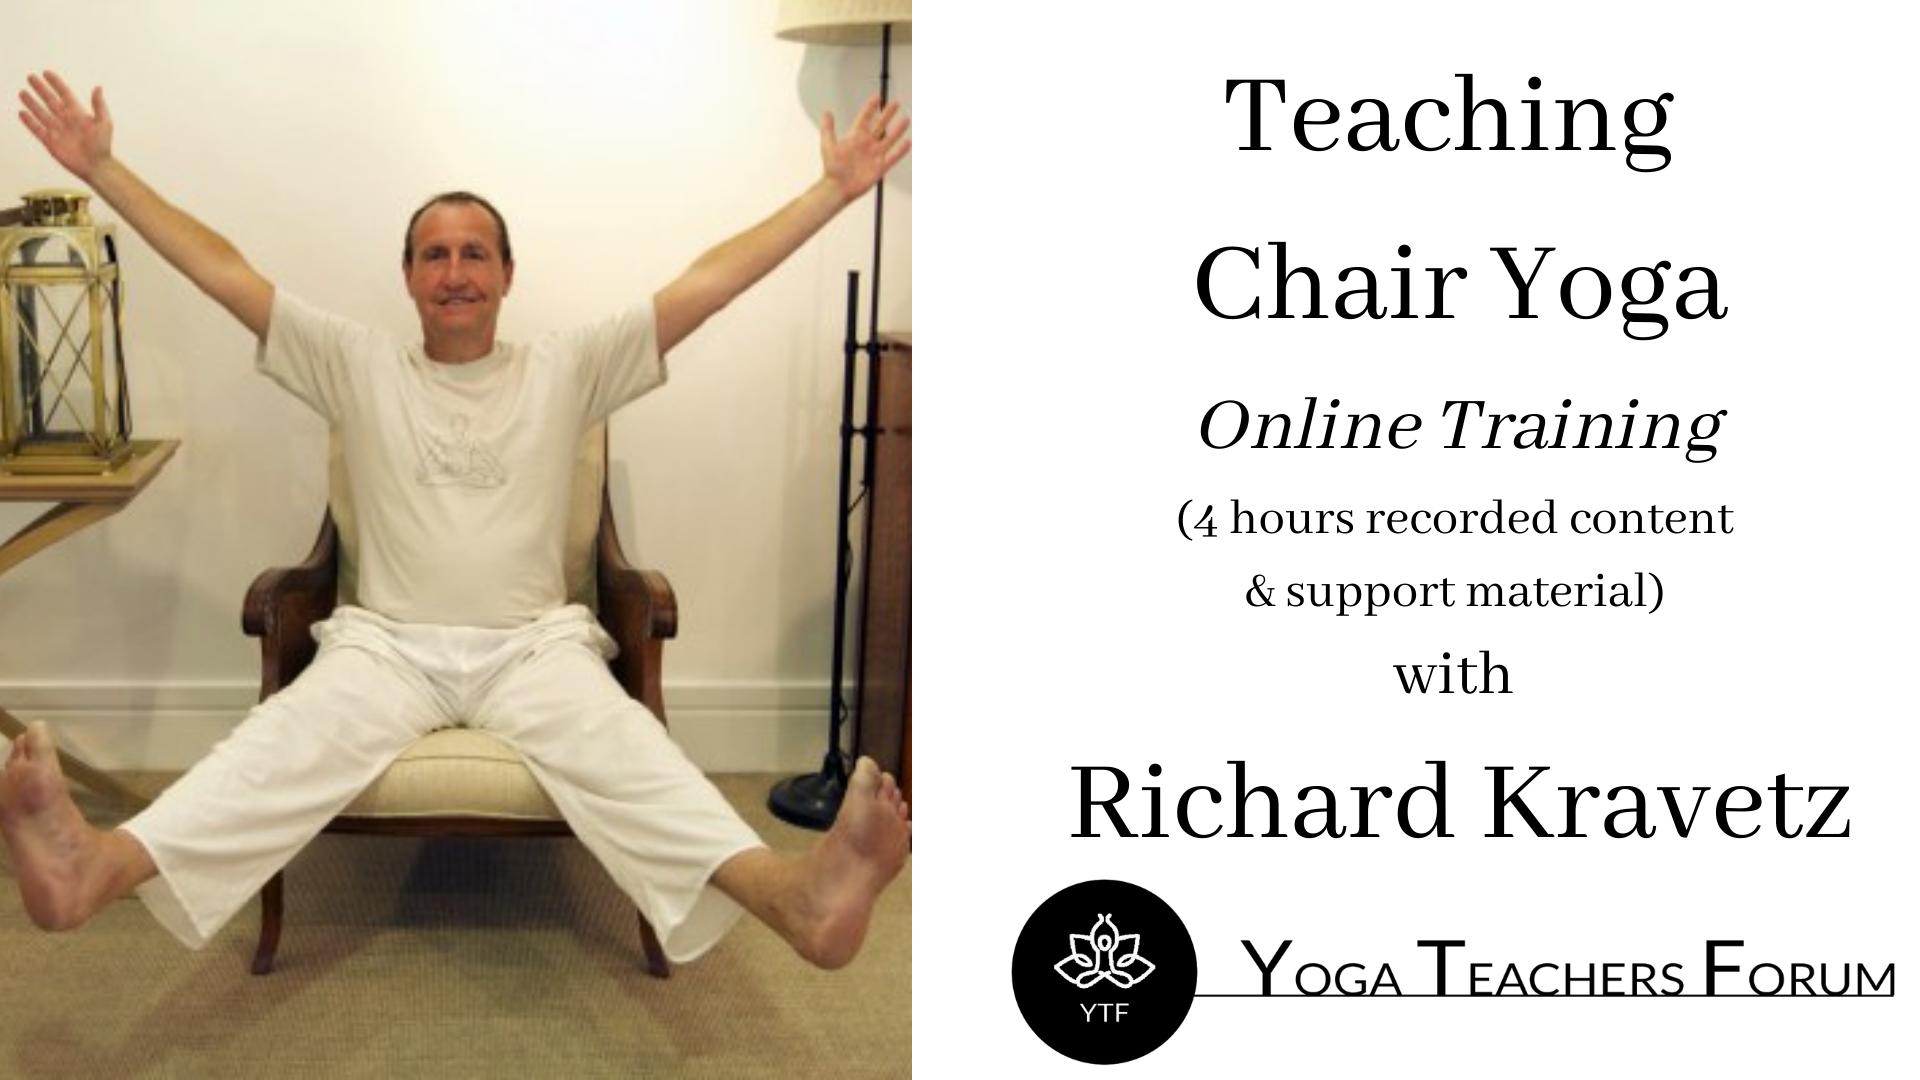 Teaching Chair Yoga Restricted Mobility Focus Sun 28 Feb 1000-1230 with Richard Kravetz-4